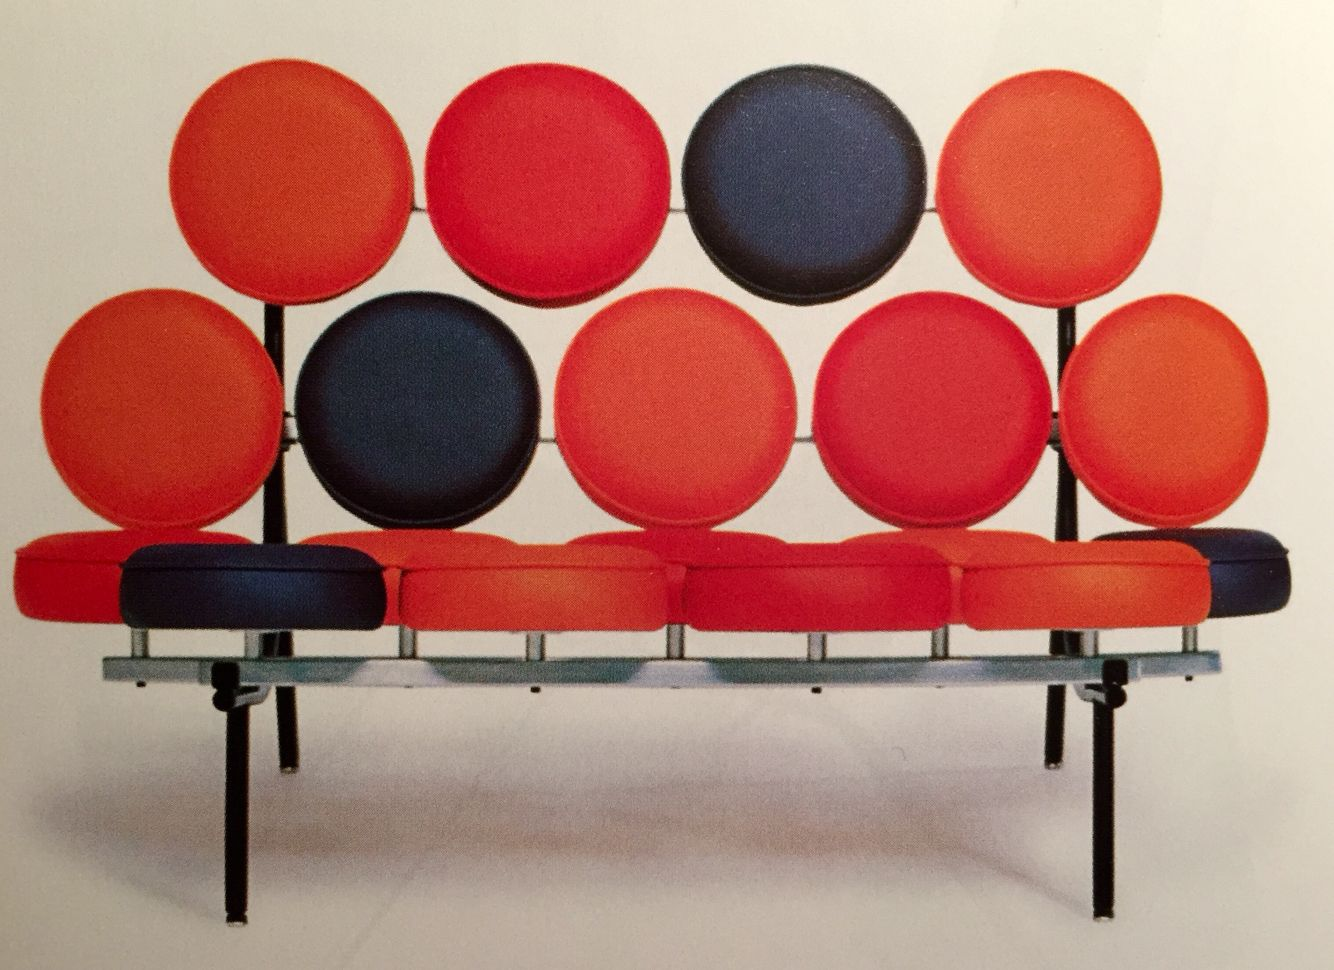 Marshmallow Sofa By Irving Harper (1956) Design